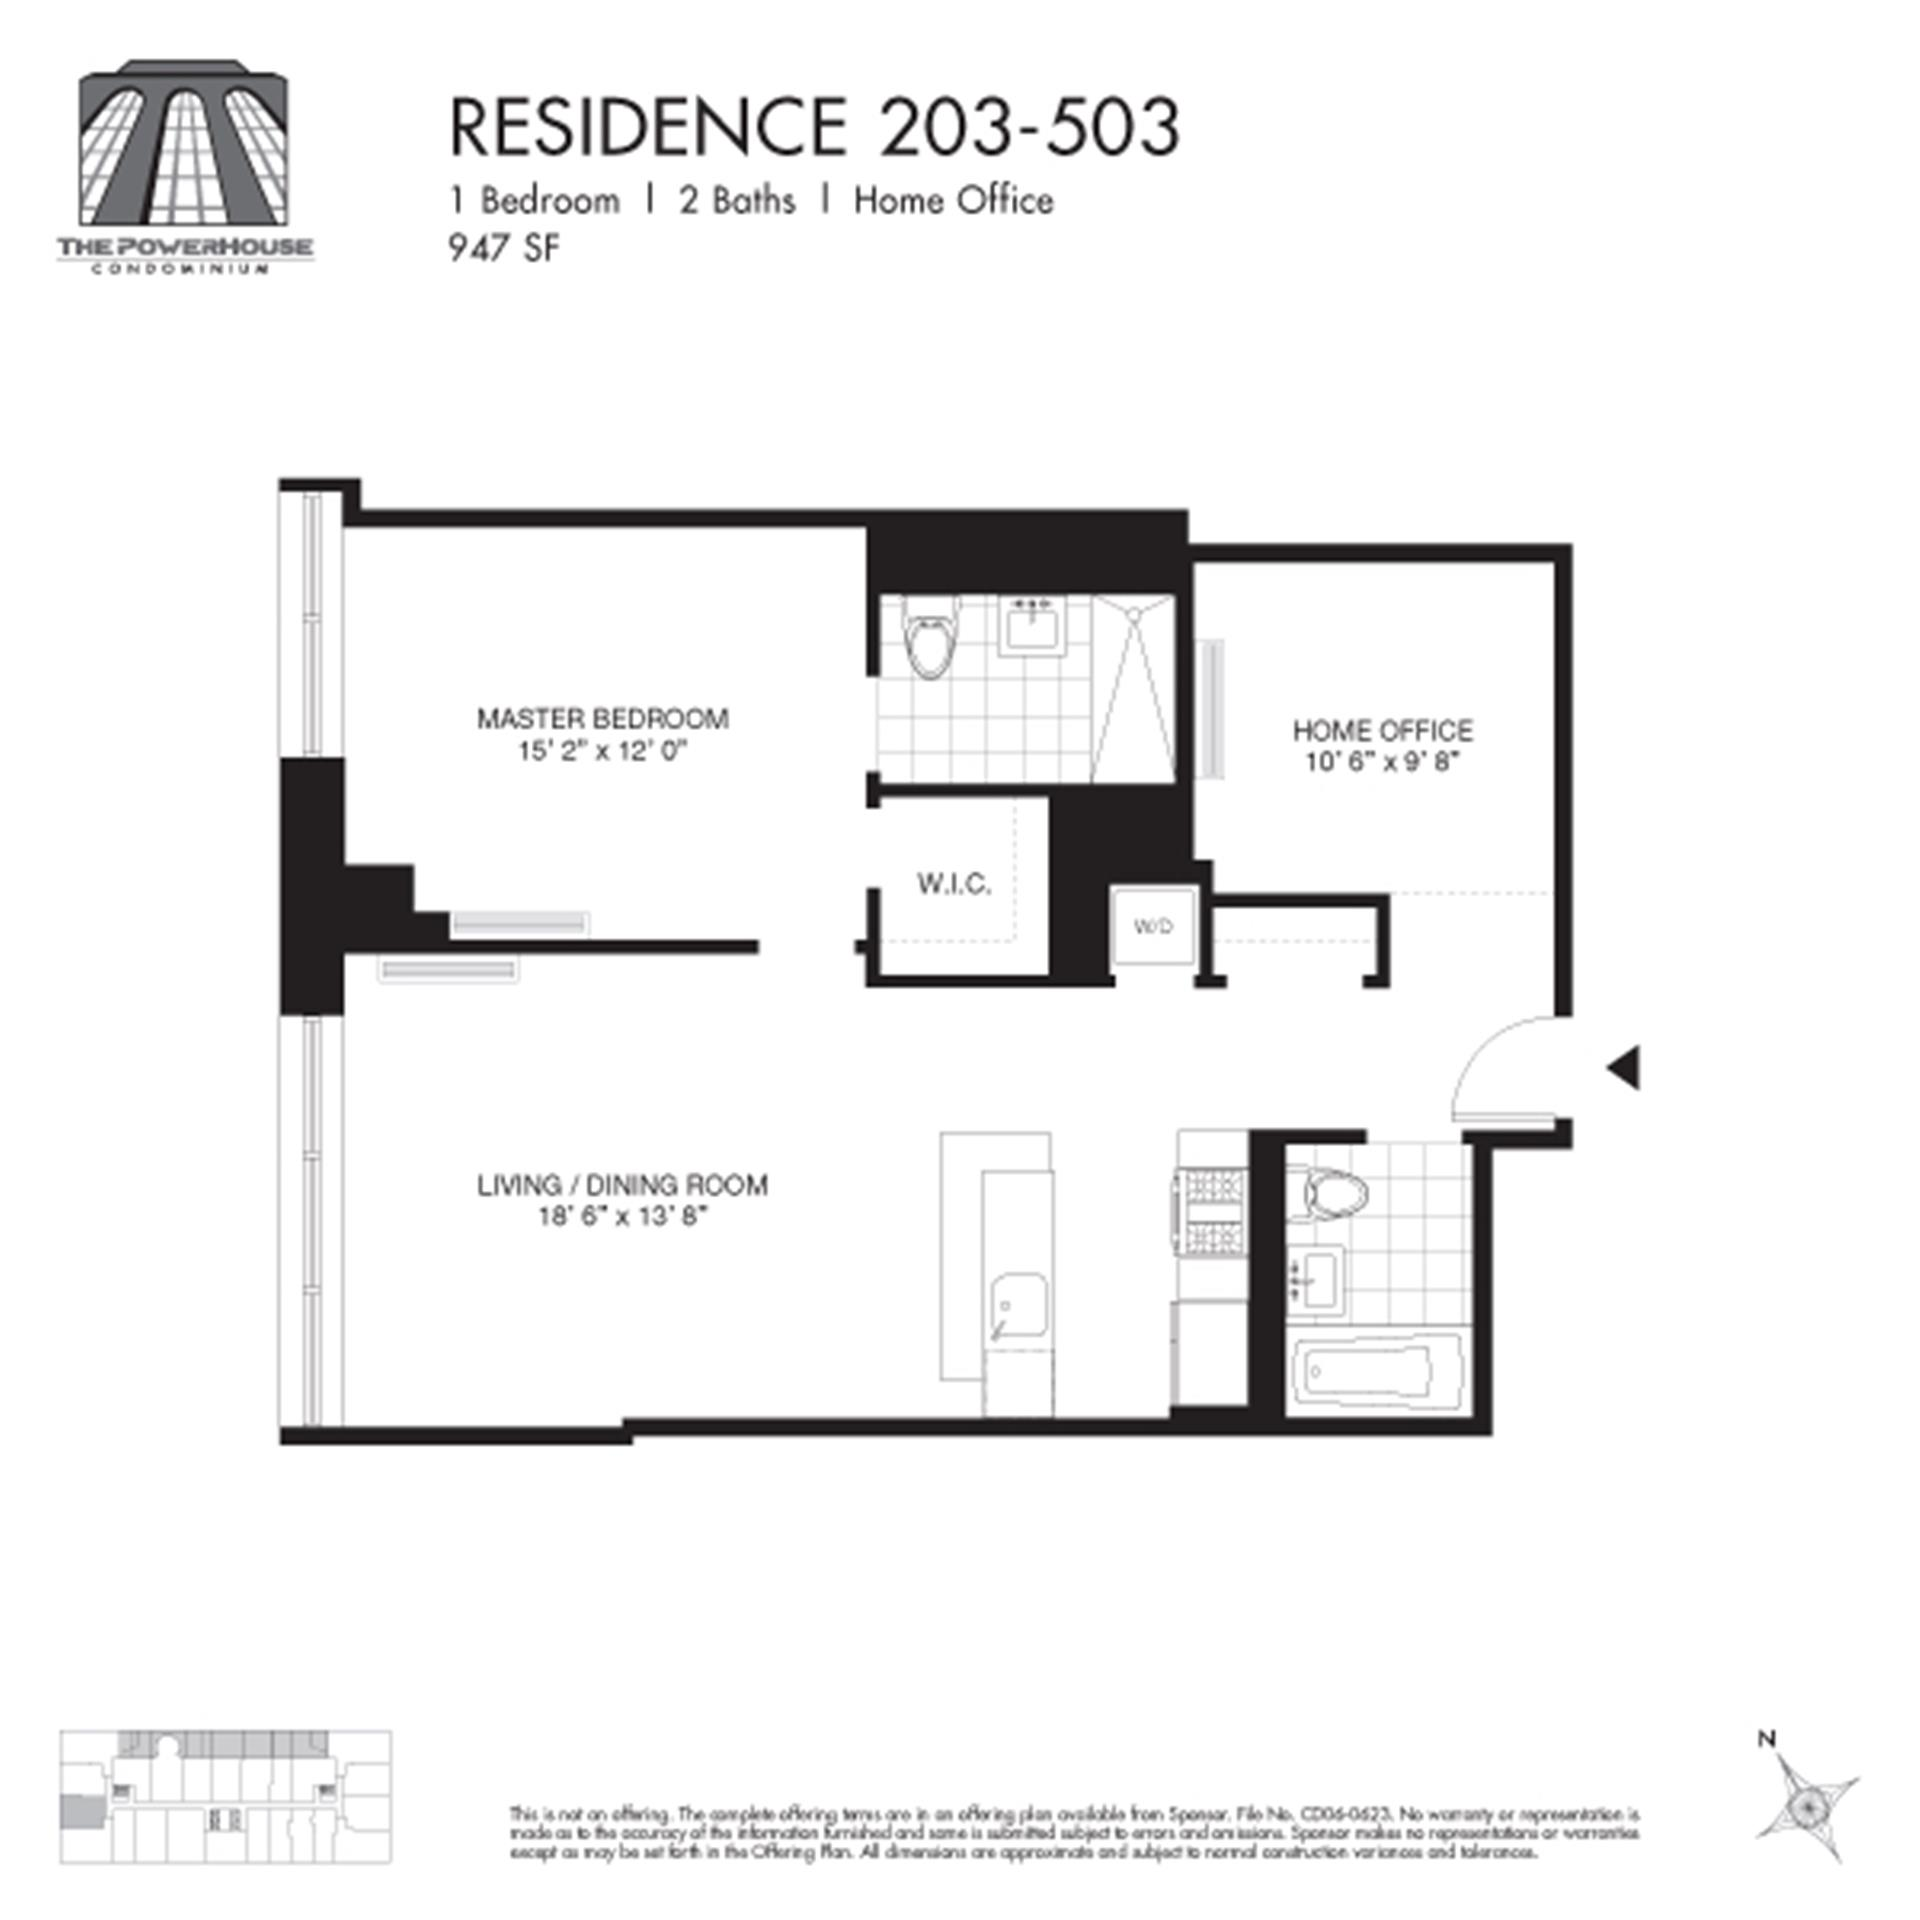 Floor plan of The Powerhouse Condo, 2-17 51st Avenue, 403 - Long Island City, New York